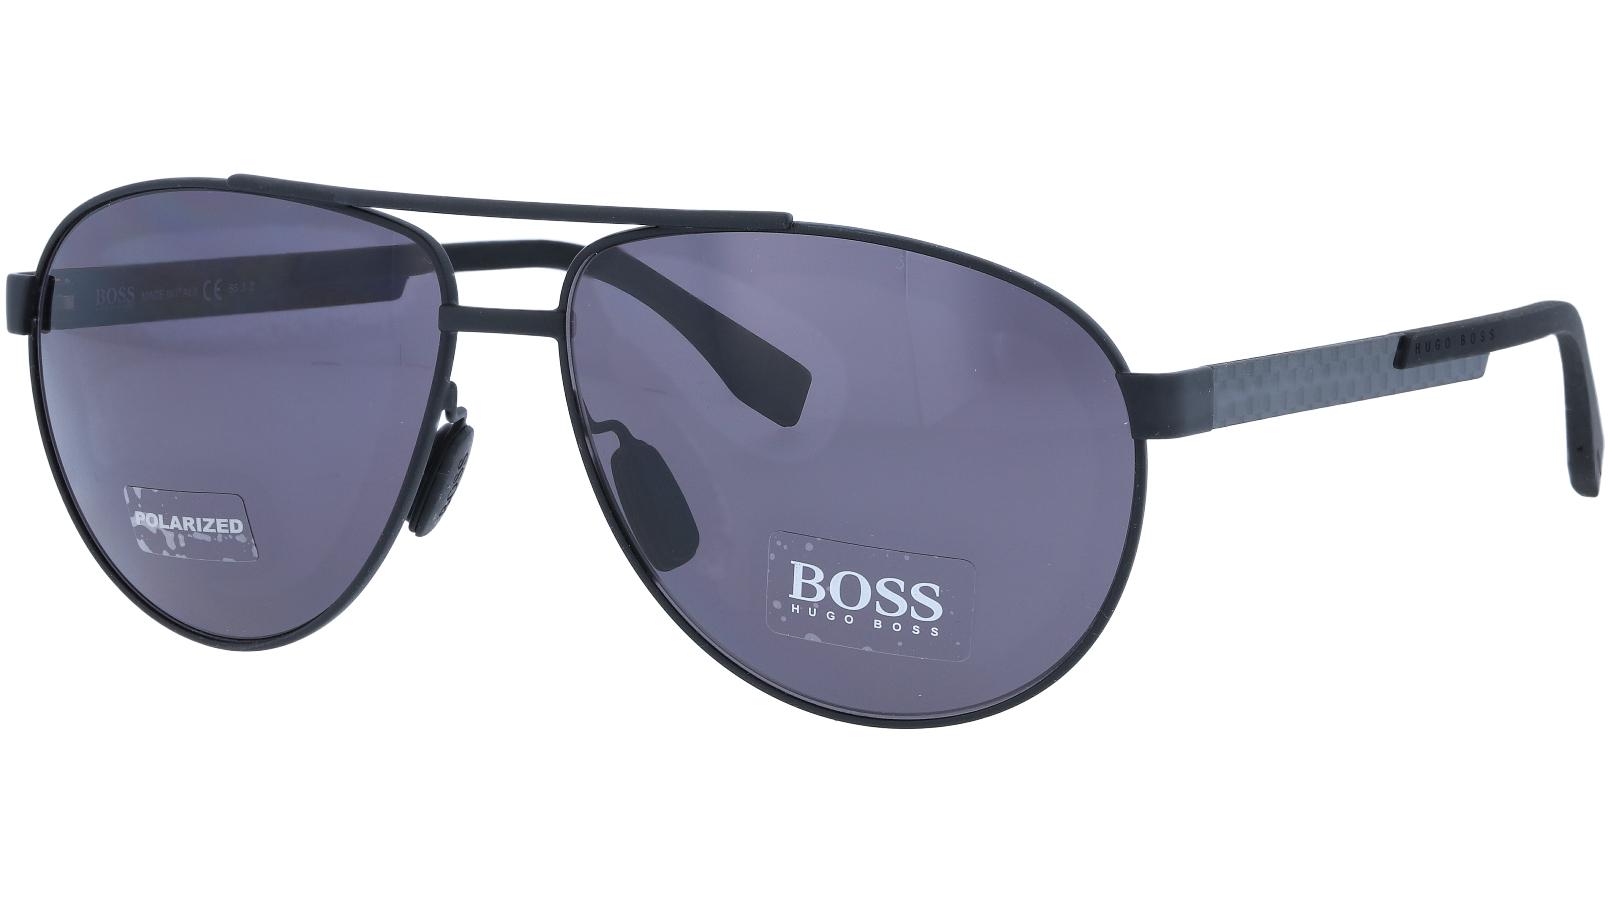 HUGO BOSS BOSS0752FS KCQ3H 53 MATT Sunglasses